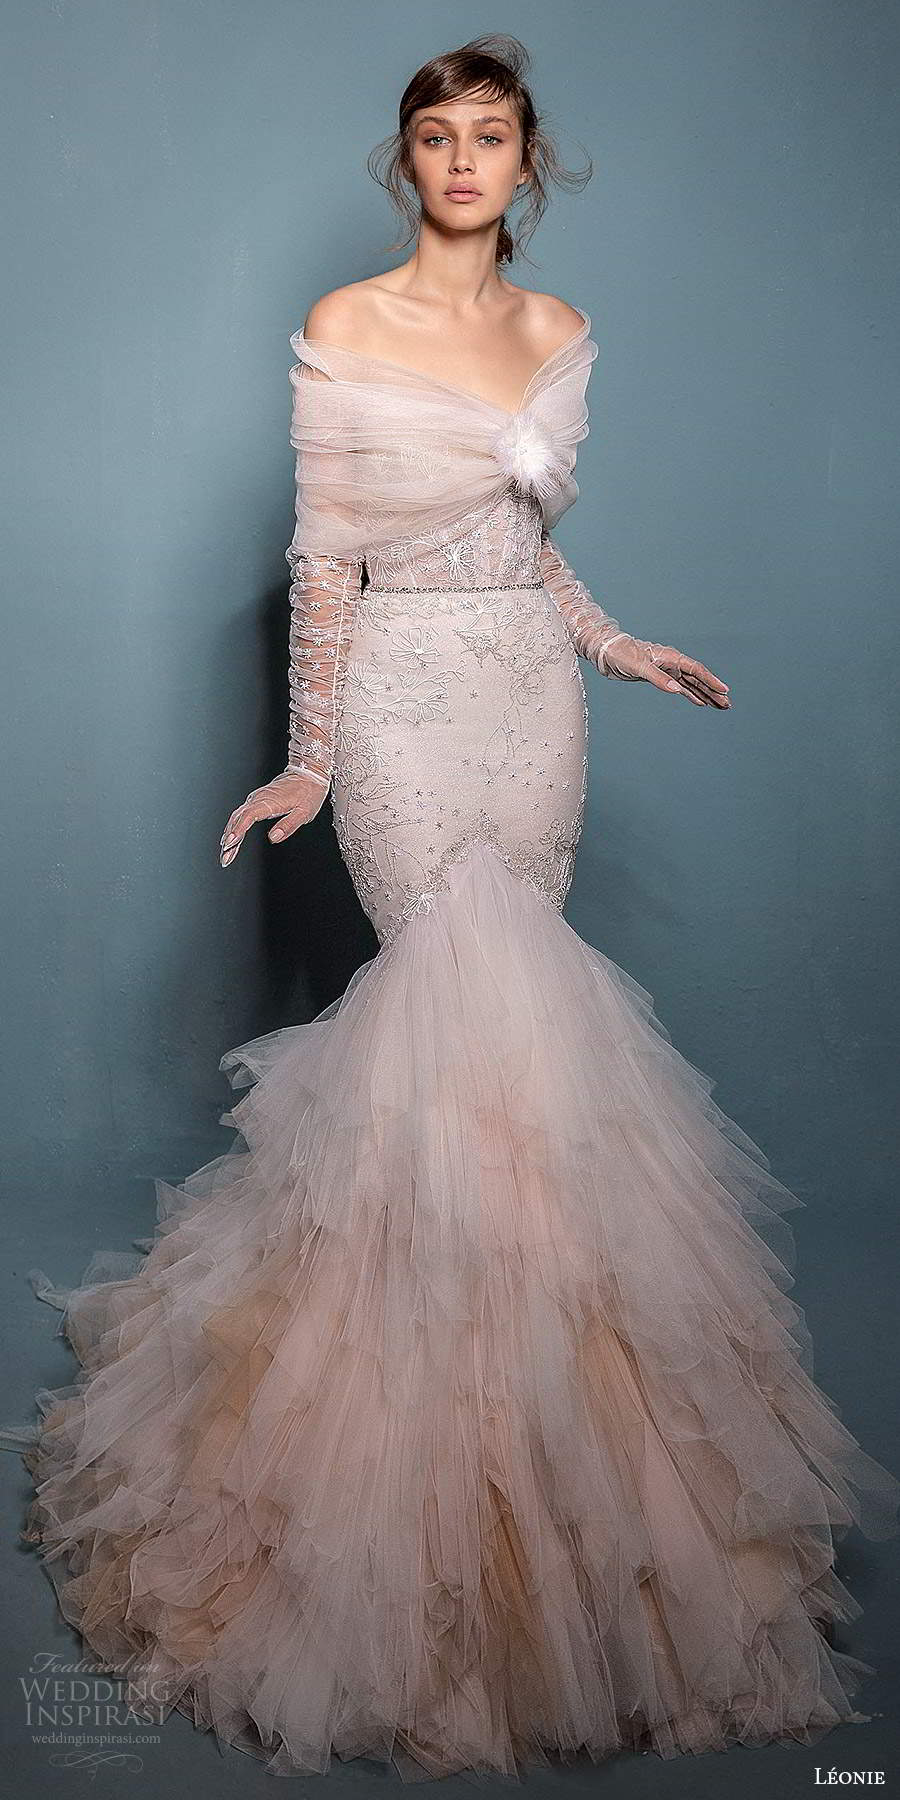 leonie bridal 2020 bridal strapless sweetheart neckline embellished fit flare mermaid wedding dress chapel train offshoulder shawl capelet (3) mv